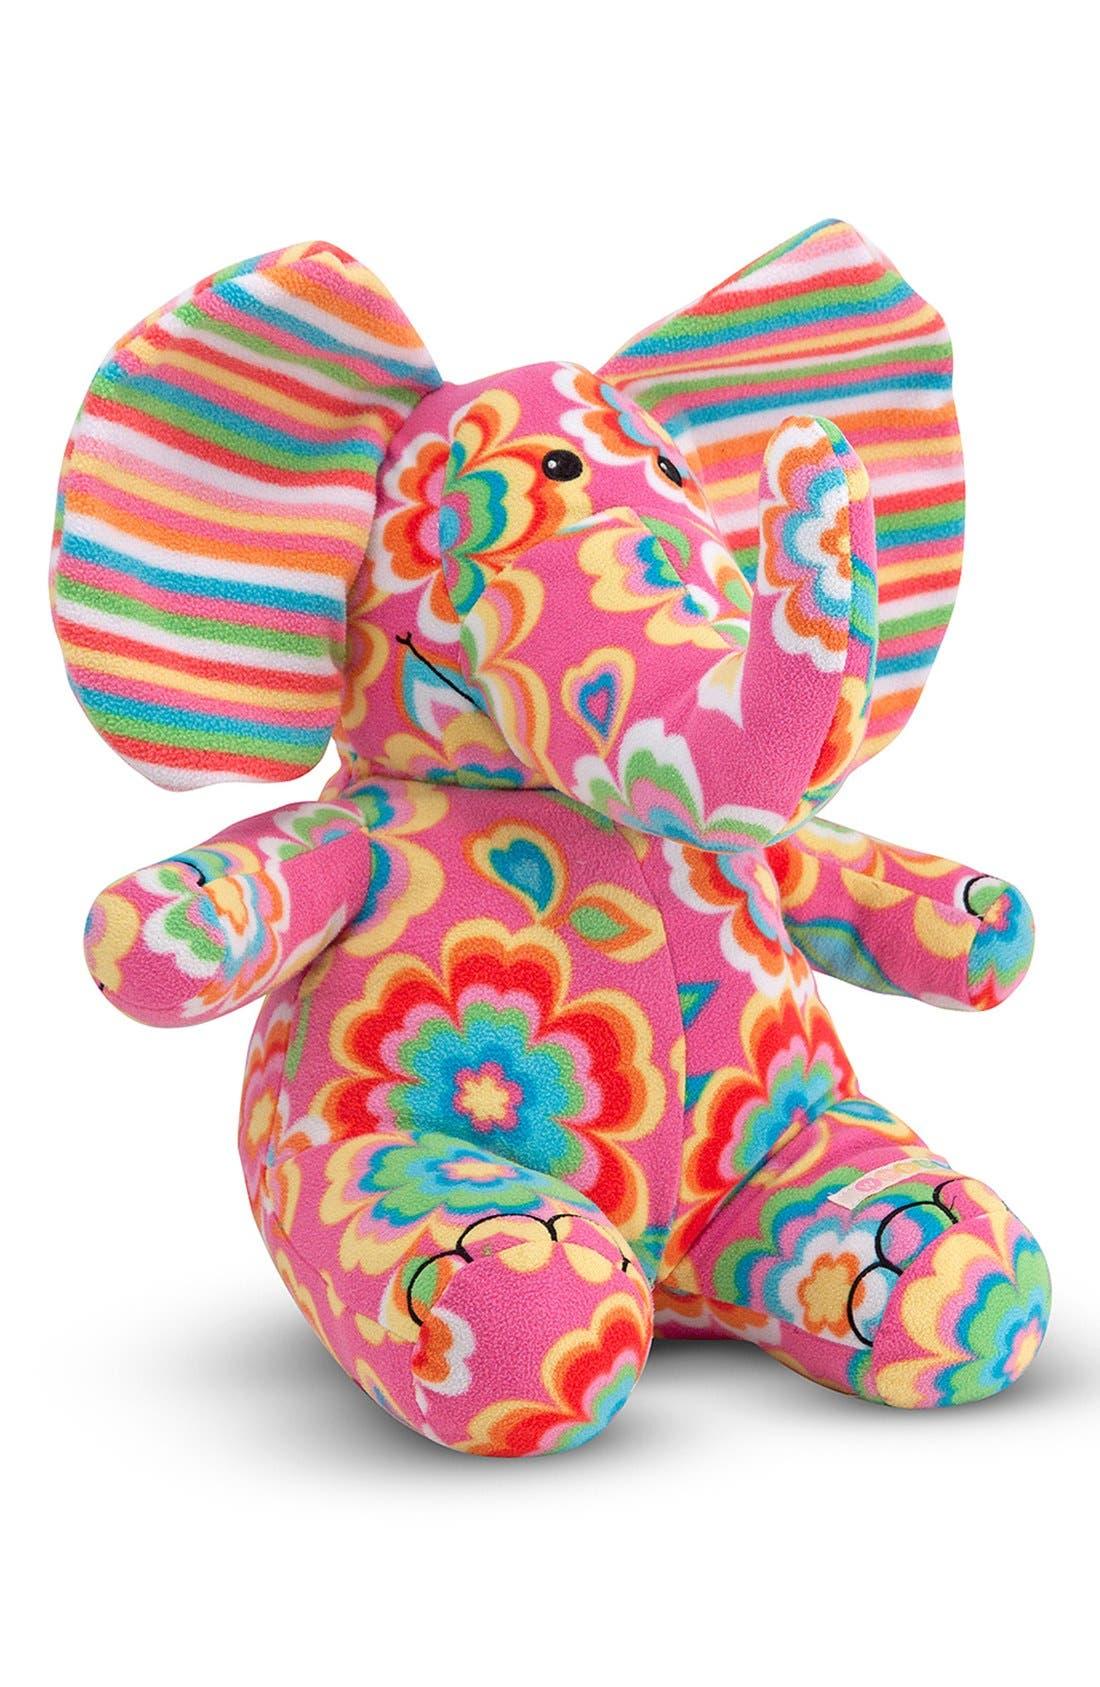 'Beeposh - Sally Elephant' Plush Toy,                         Main,                         color, Pink